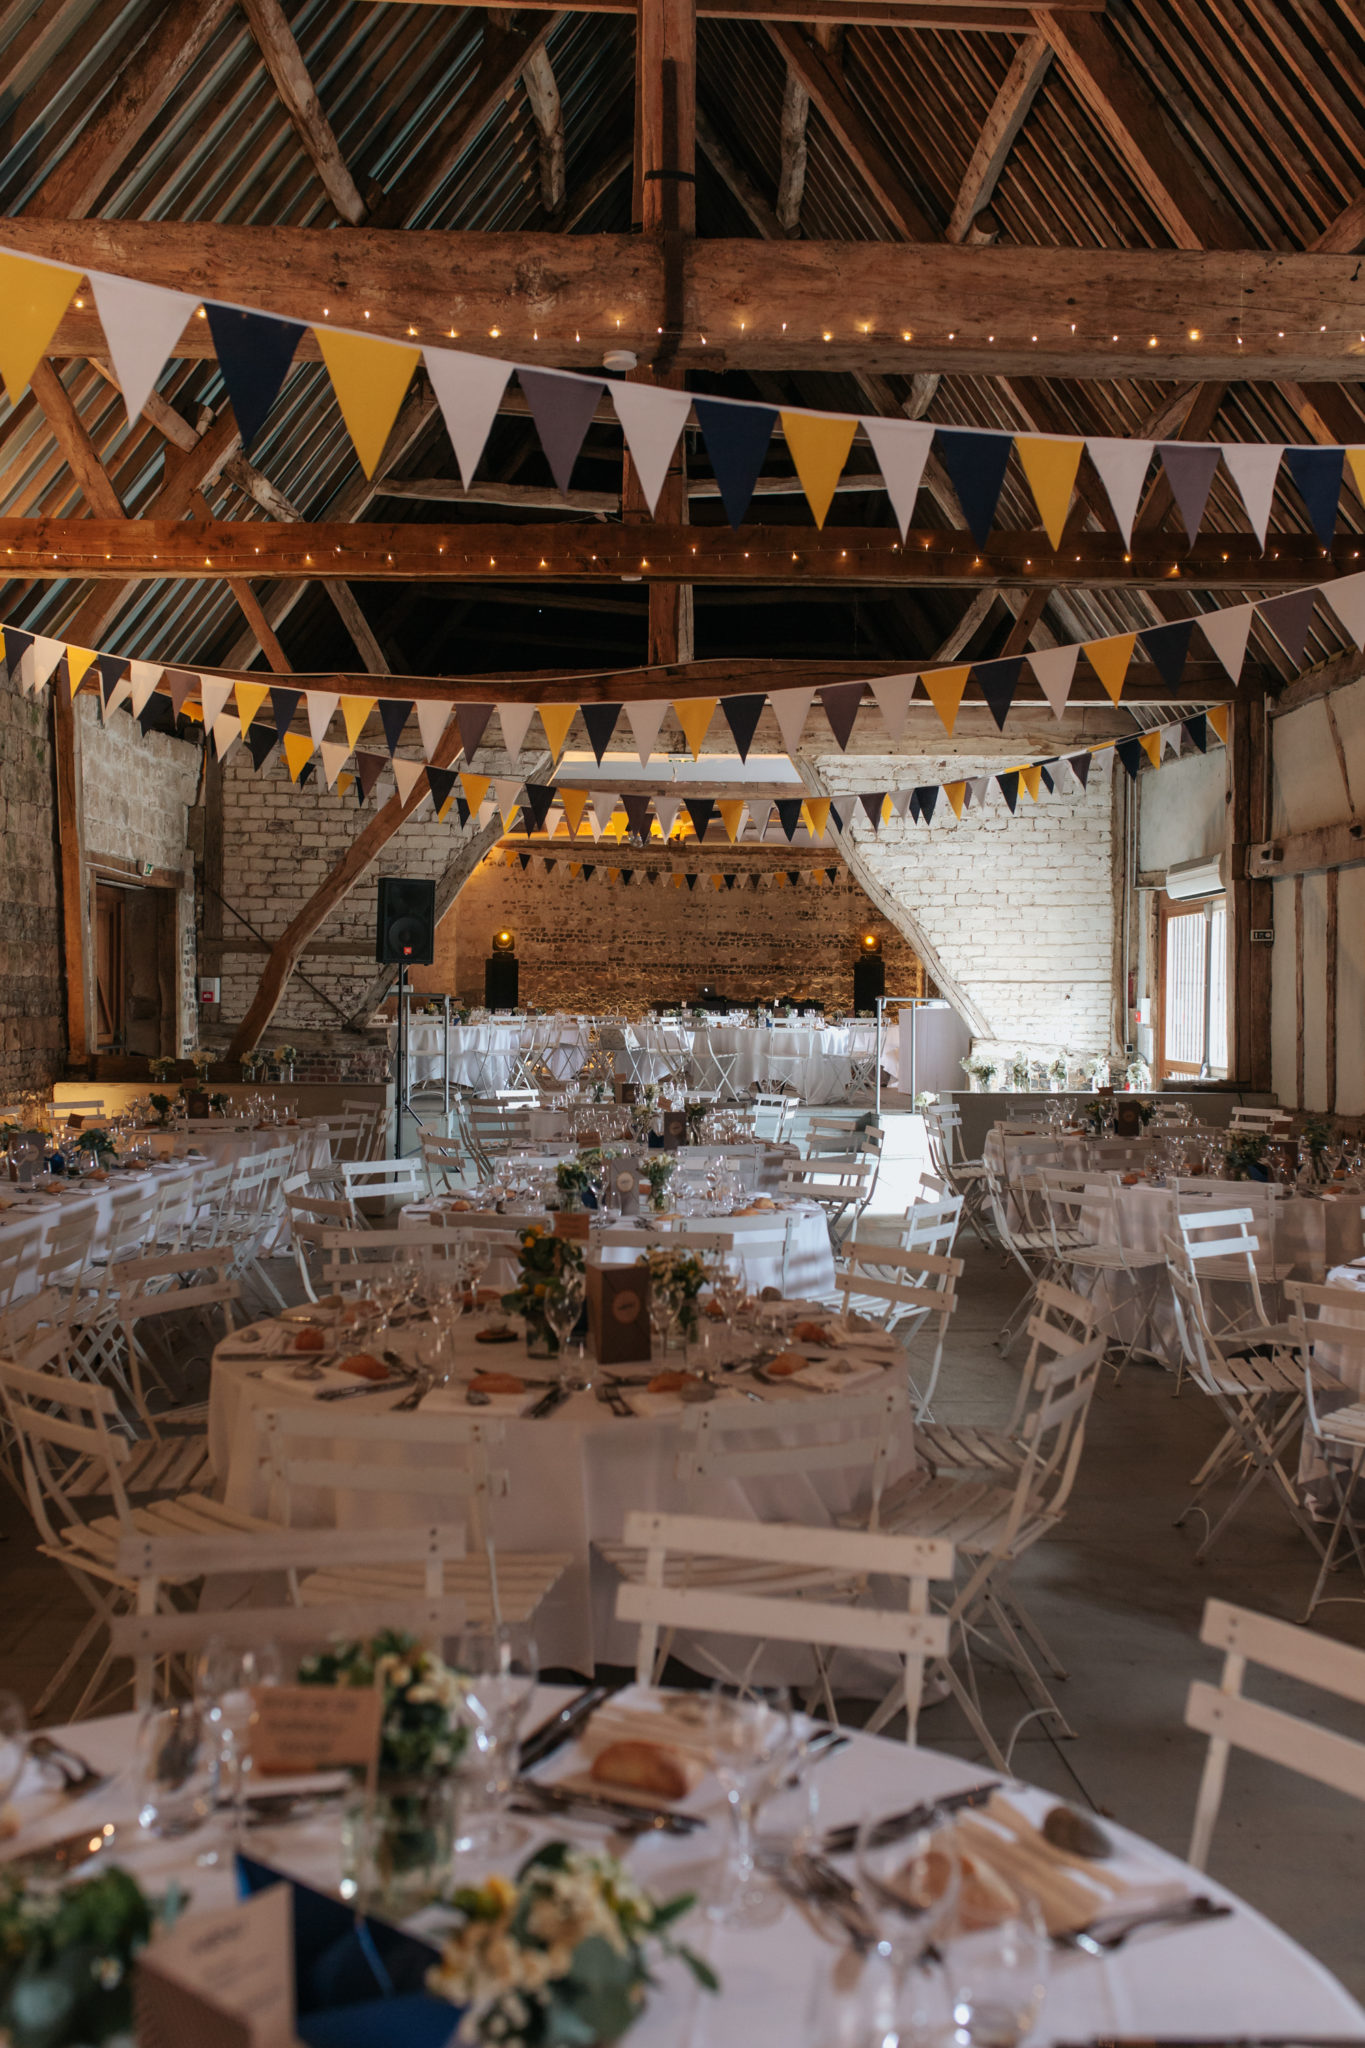 Salle réception dîner Manoir Ango Varengeville sur Mer